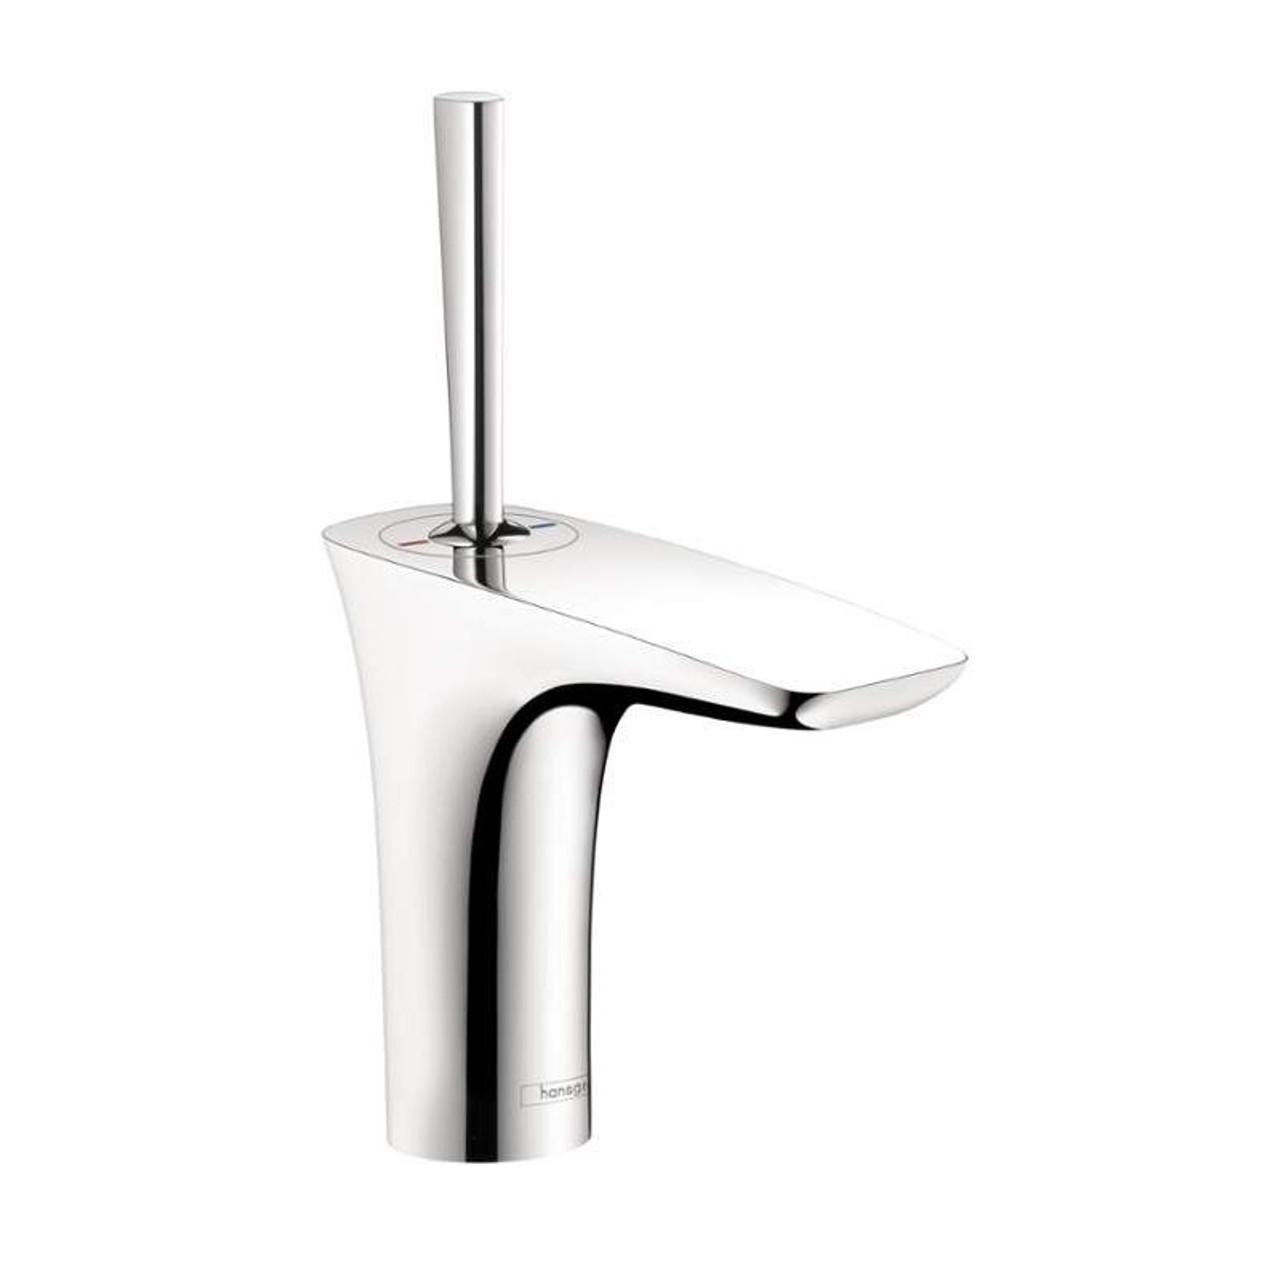 Bathroom Faucet Hansgrohe Puravida Lever Chrome